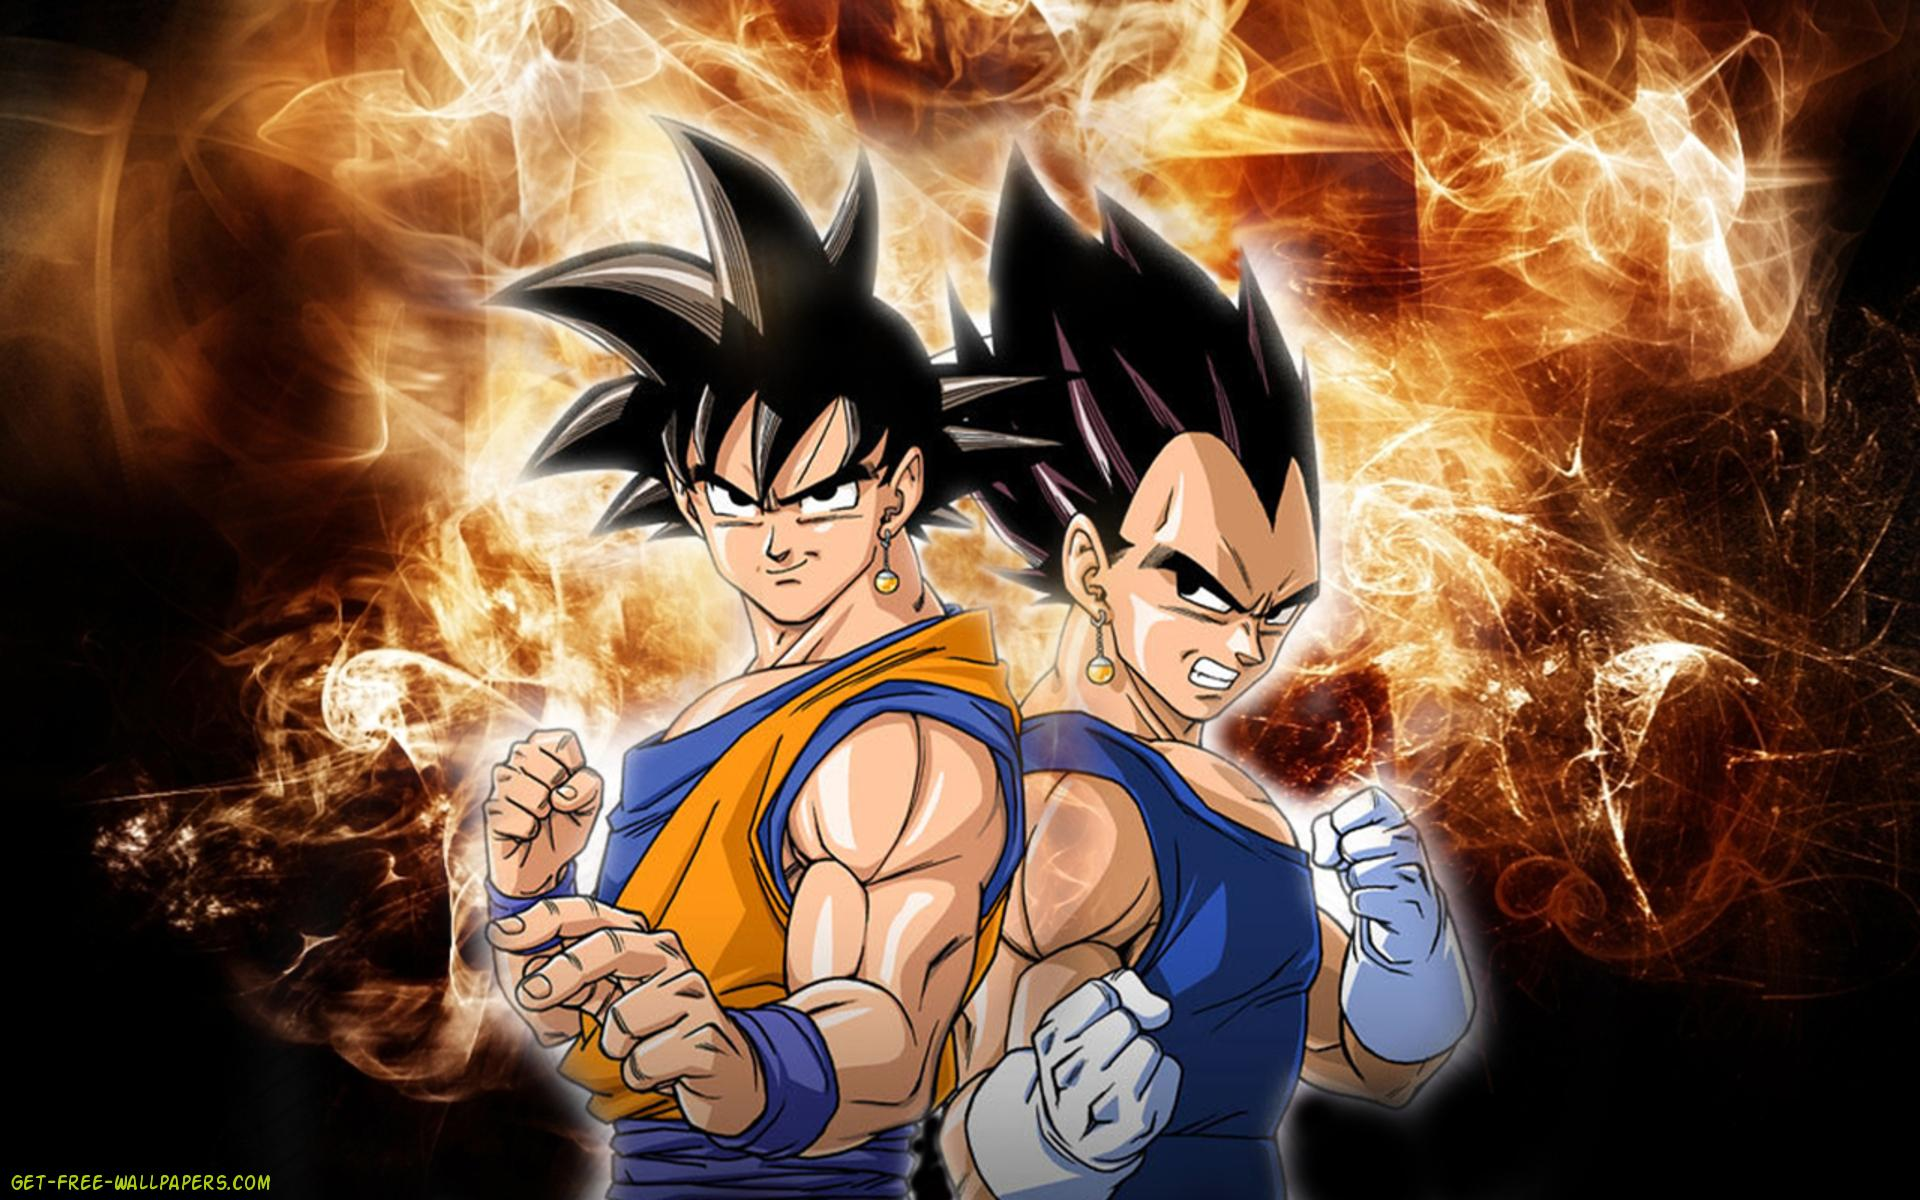 Download Goku And Vegeta Wallpaper 1920x1200